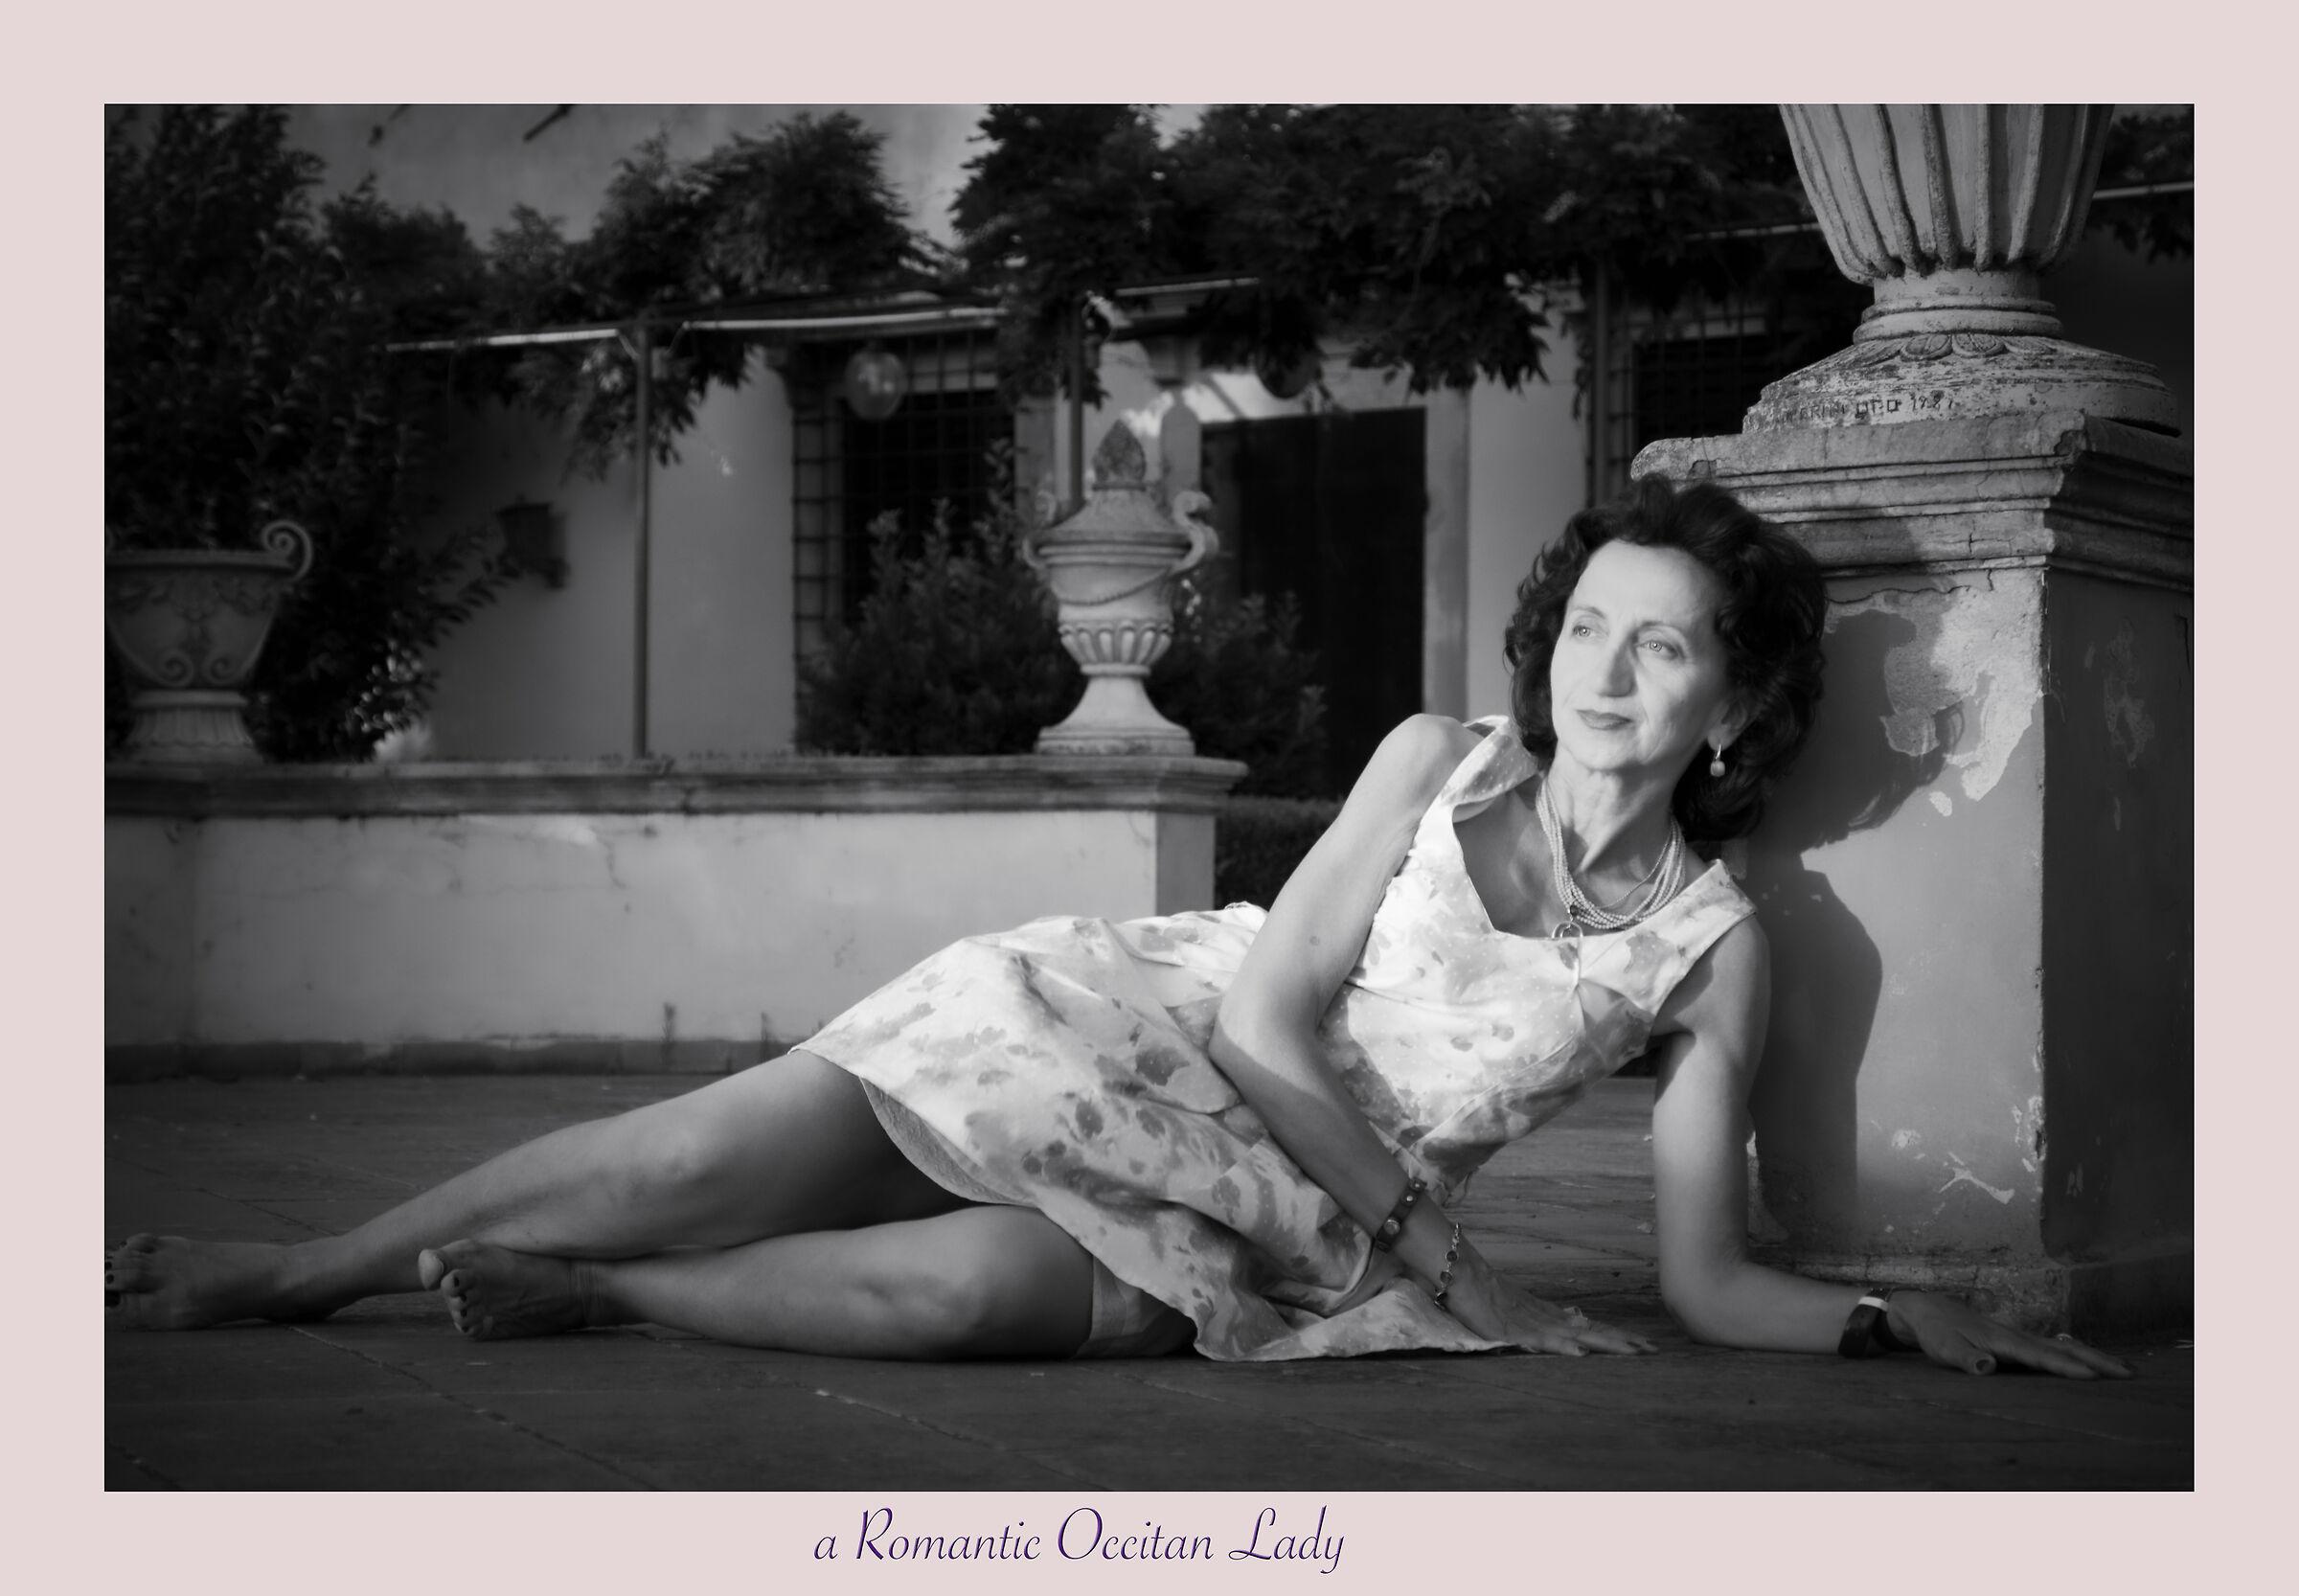 to Romantic Occitan Lady...